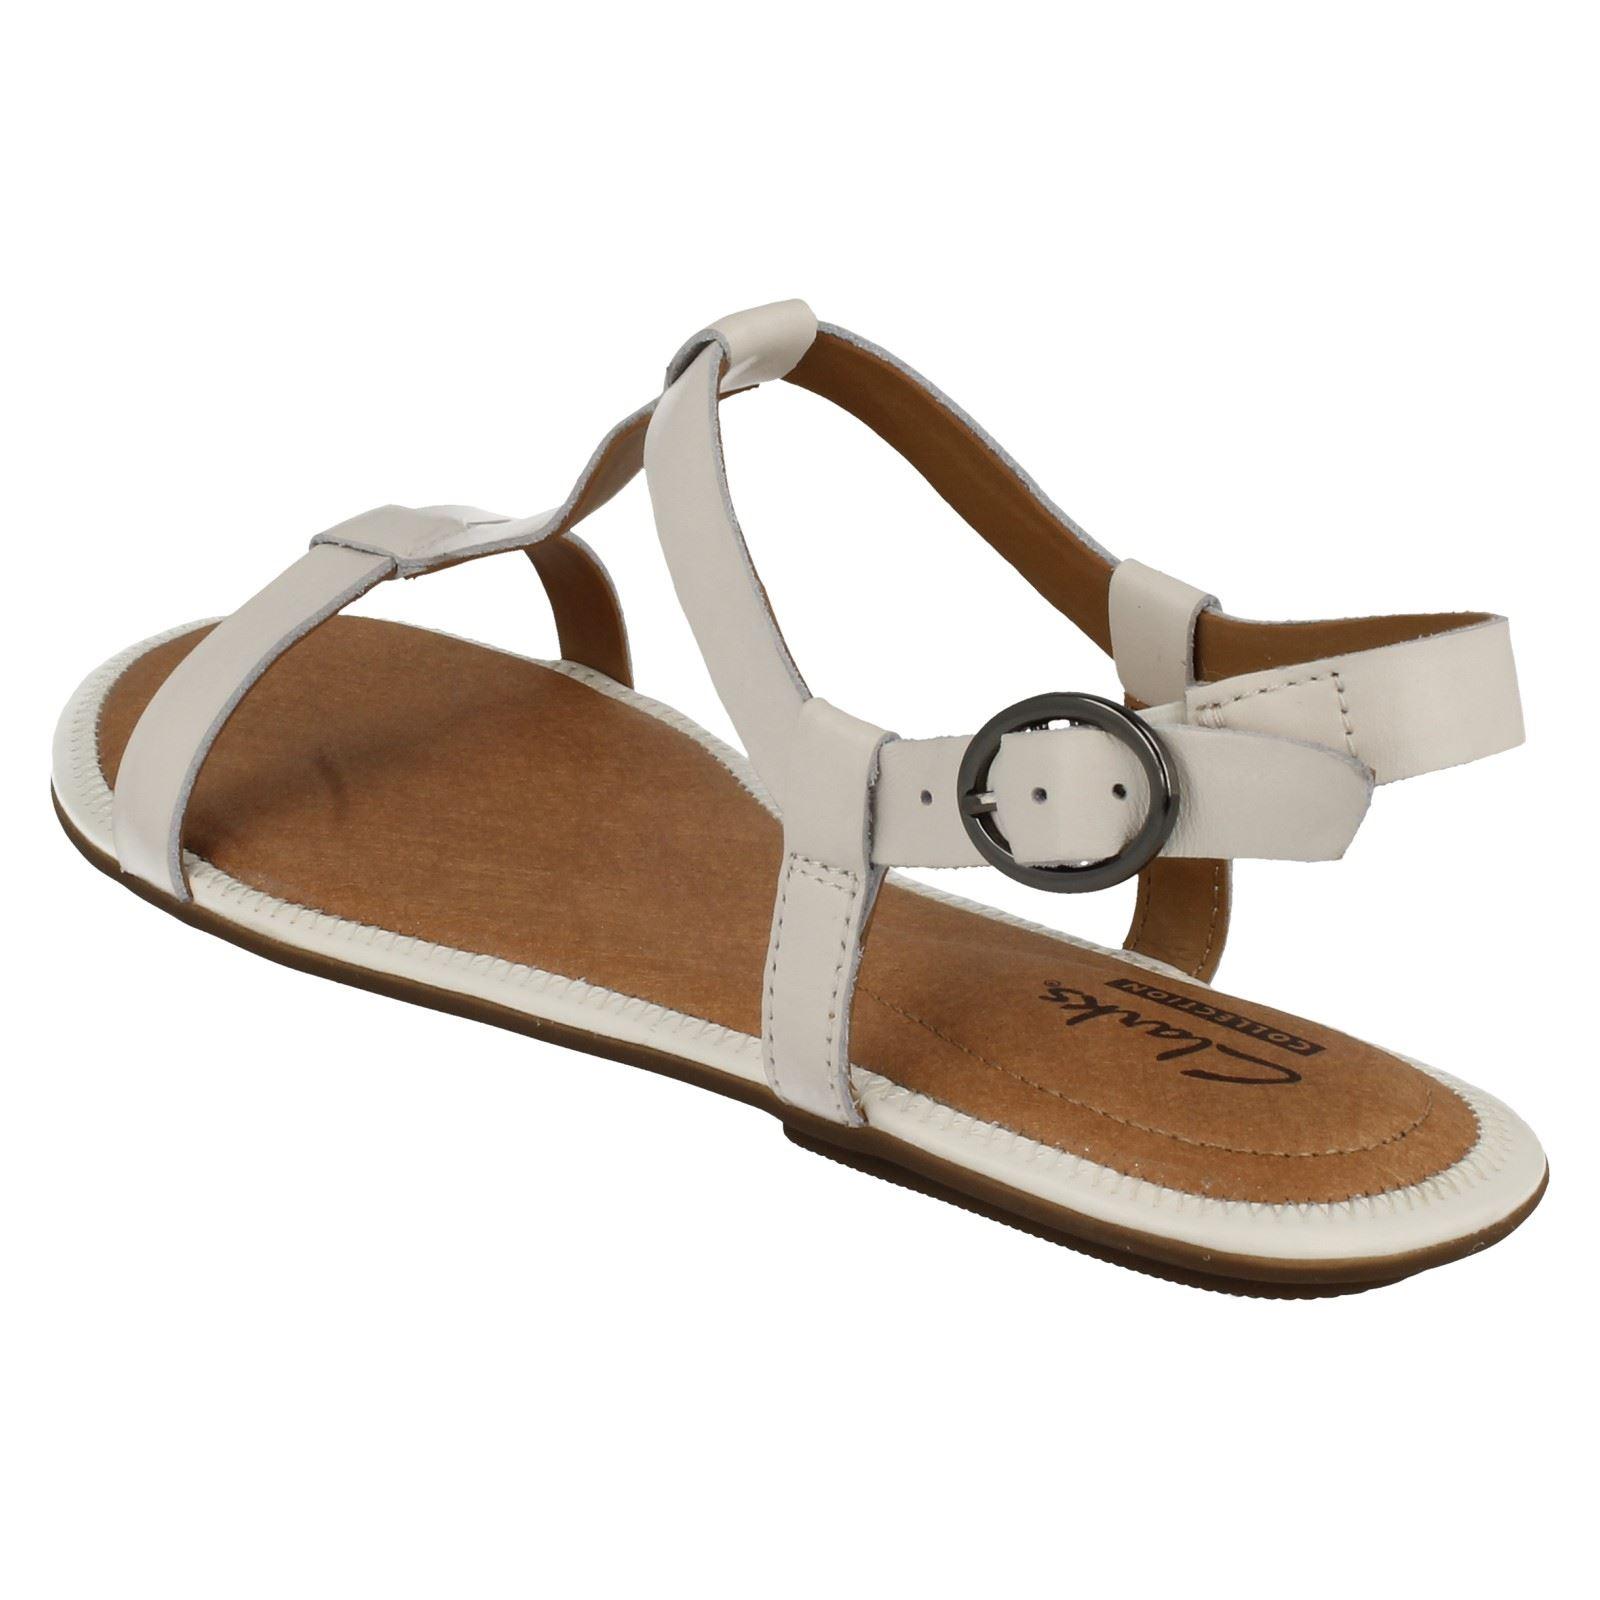 1d4455ddf37b Buy clarks diamante sandals cheap